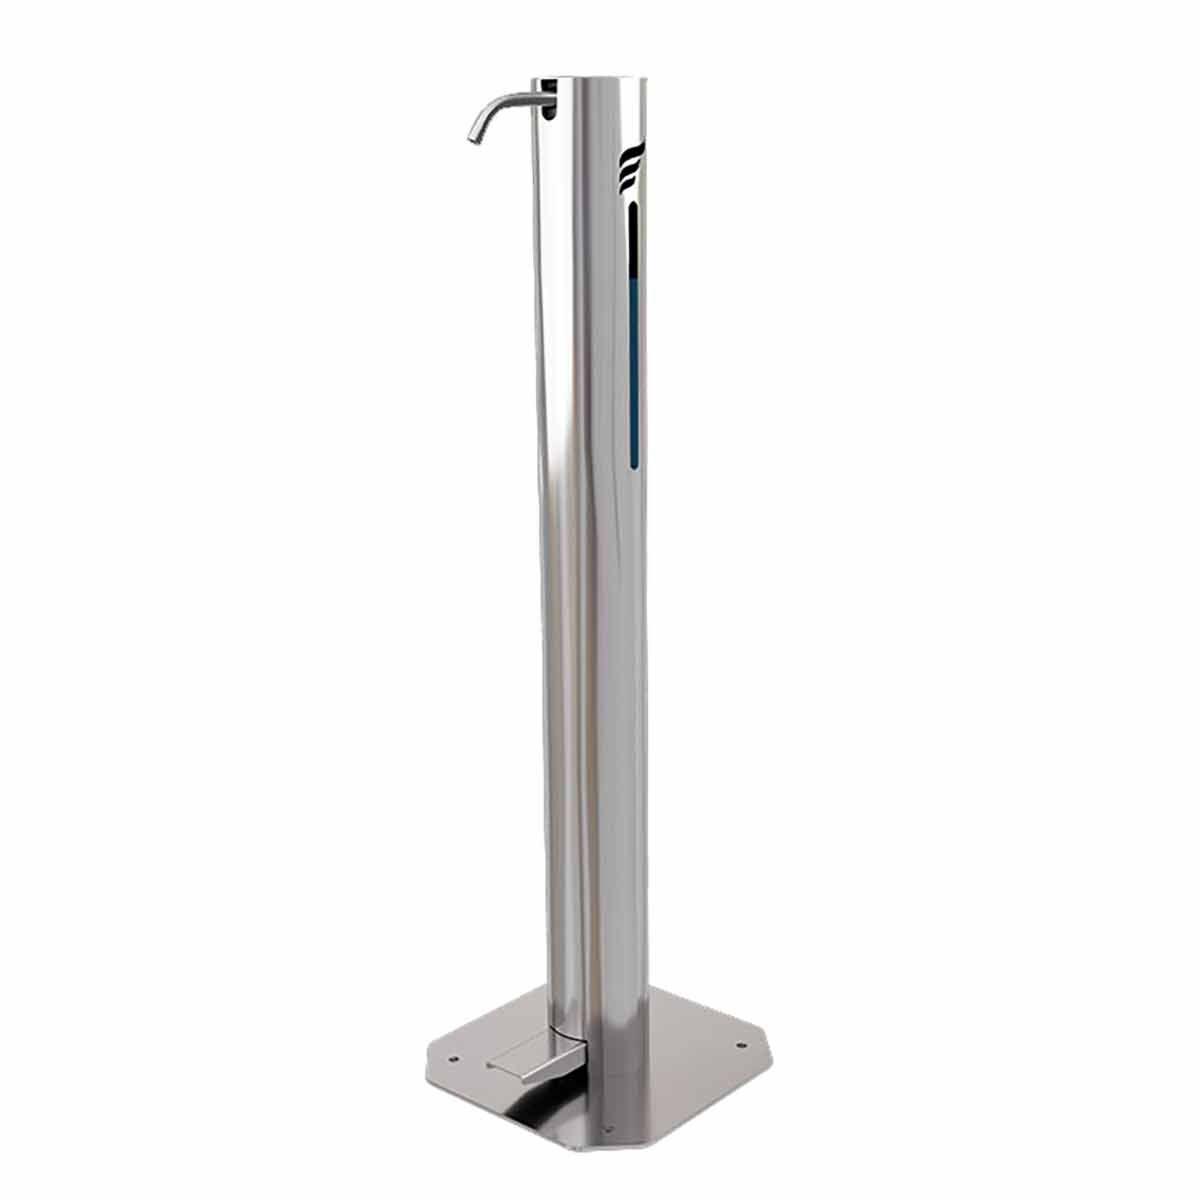 Astreea Foot Operated Sanitiser Dispenser Medium